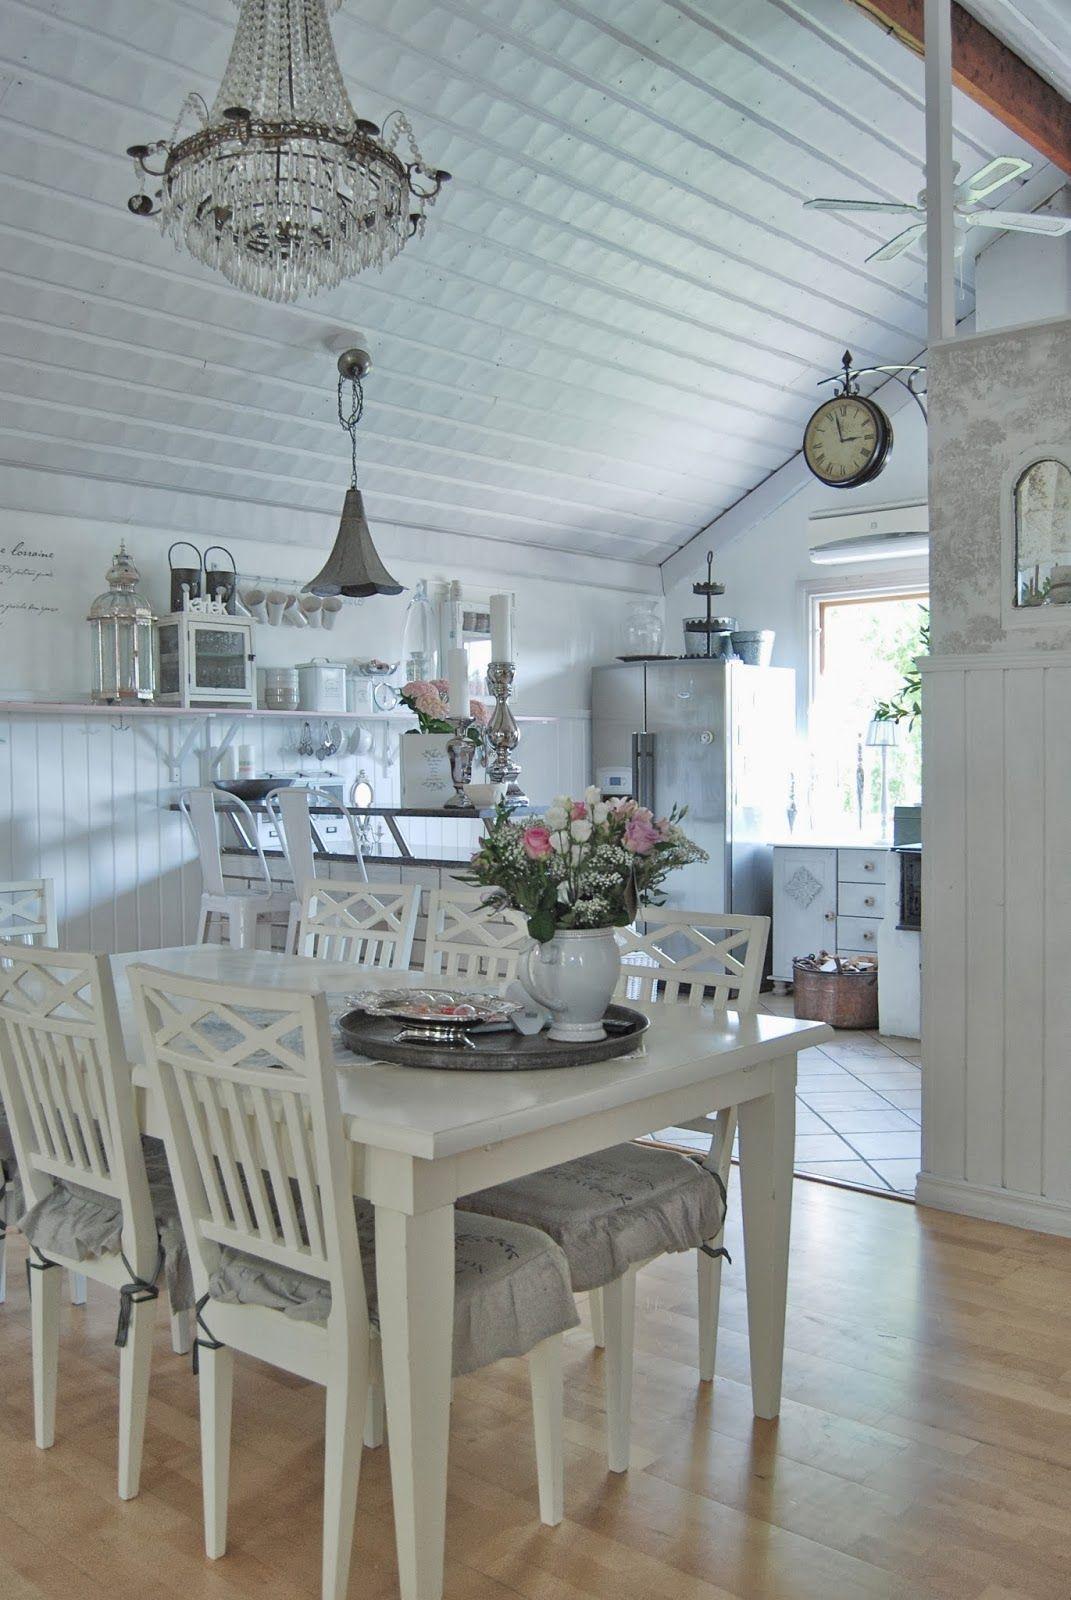 Shabby Chic   Home Decor   Pinterest   Shabby, Om and Kitchens